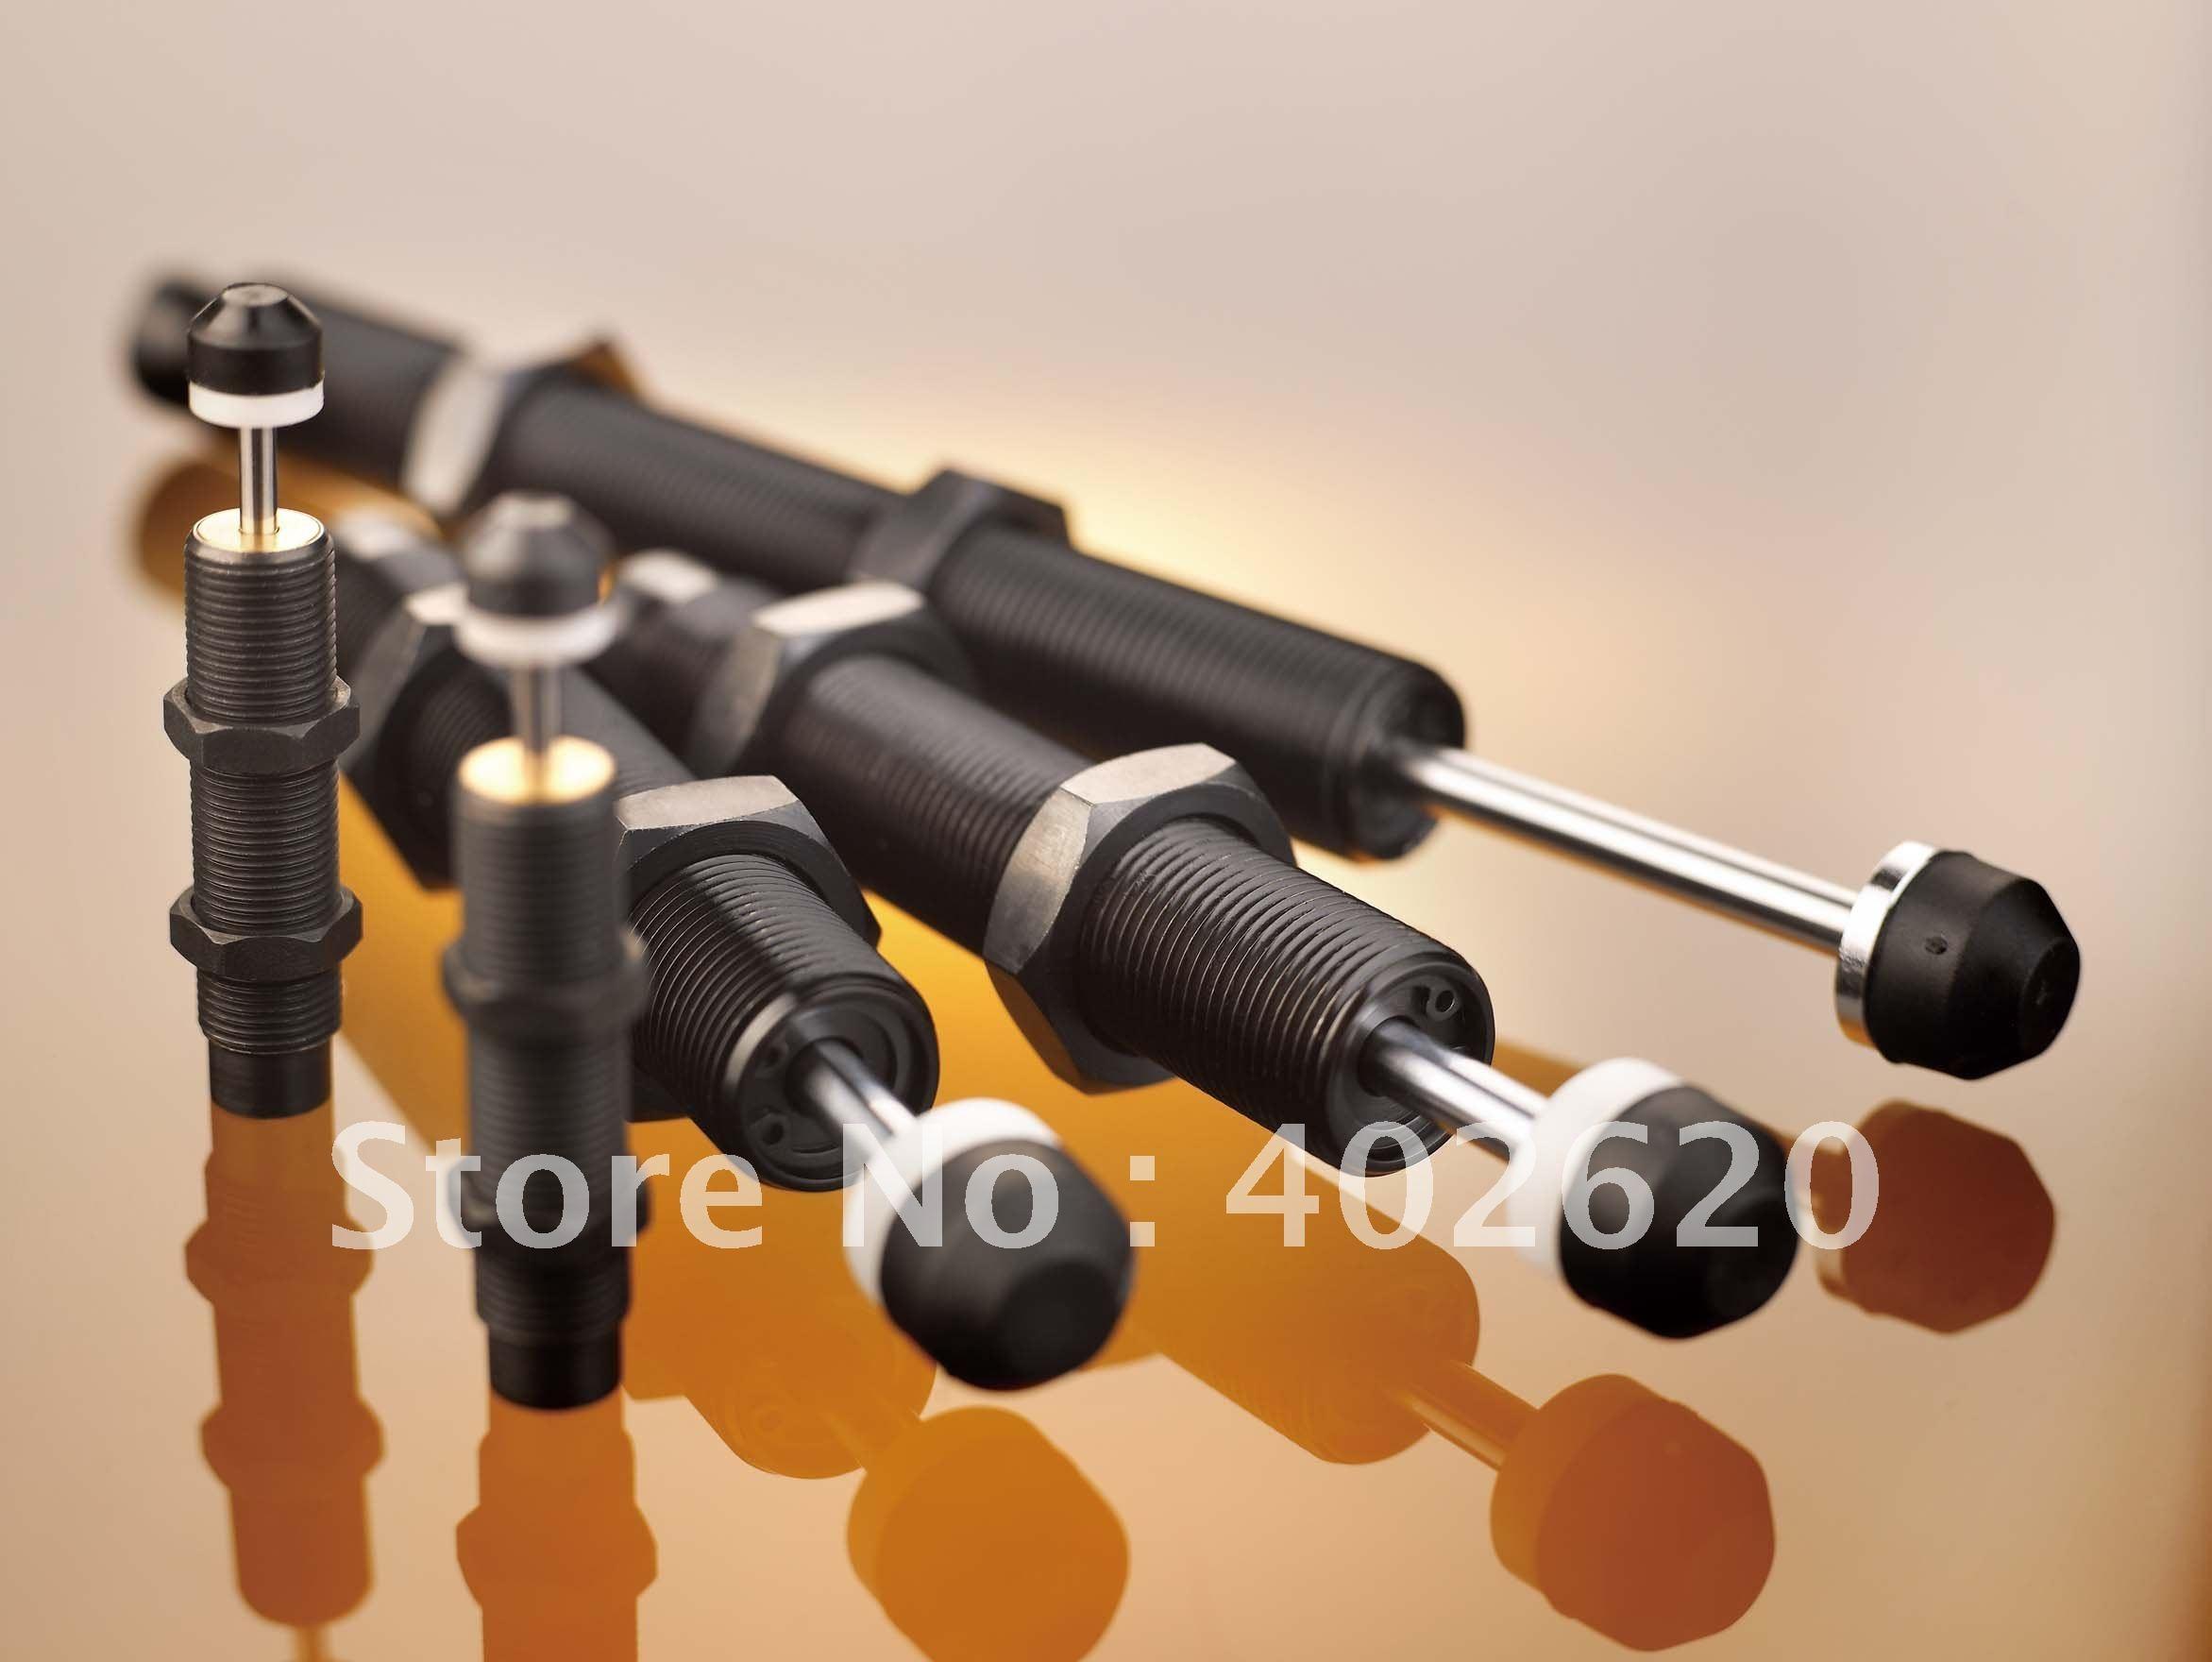 Shock Absorber,  HR30, absorber, buffer, bumper, free shipping<br>